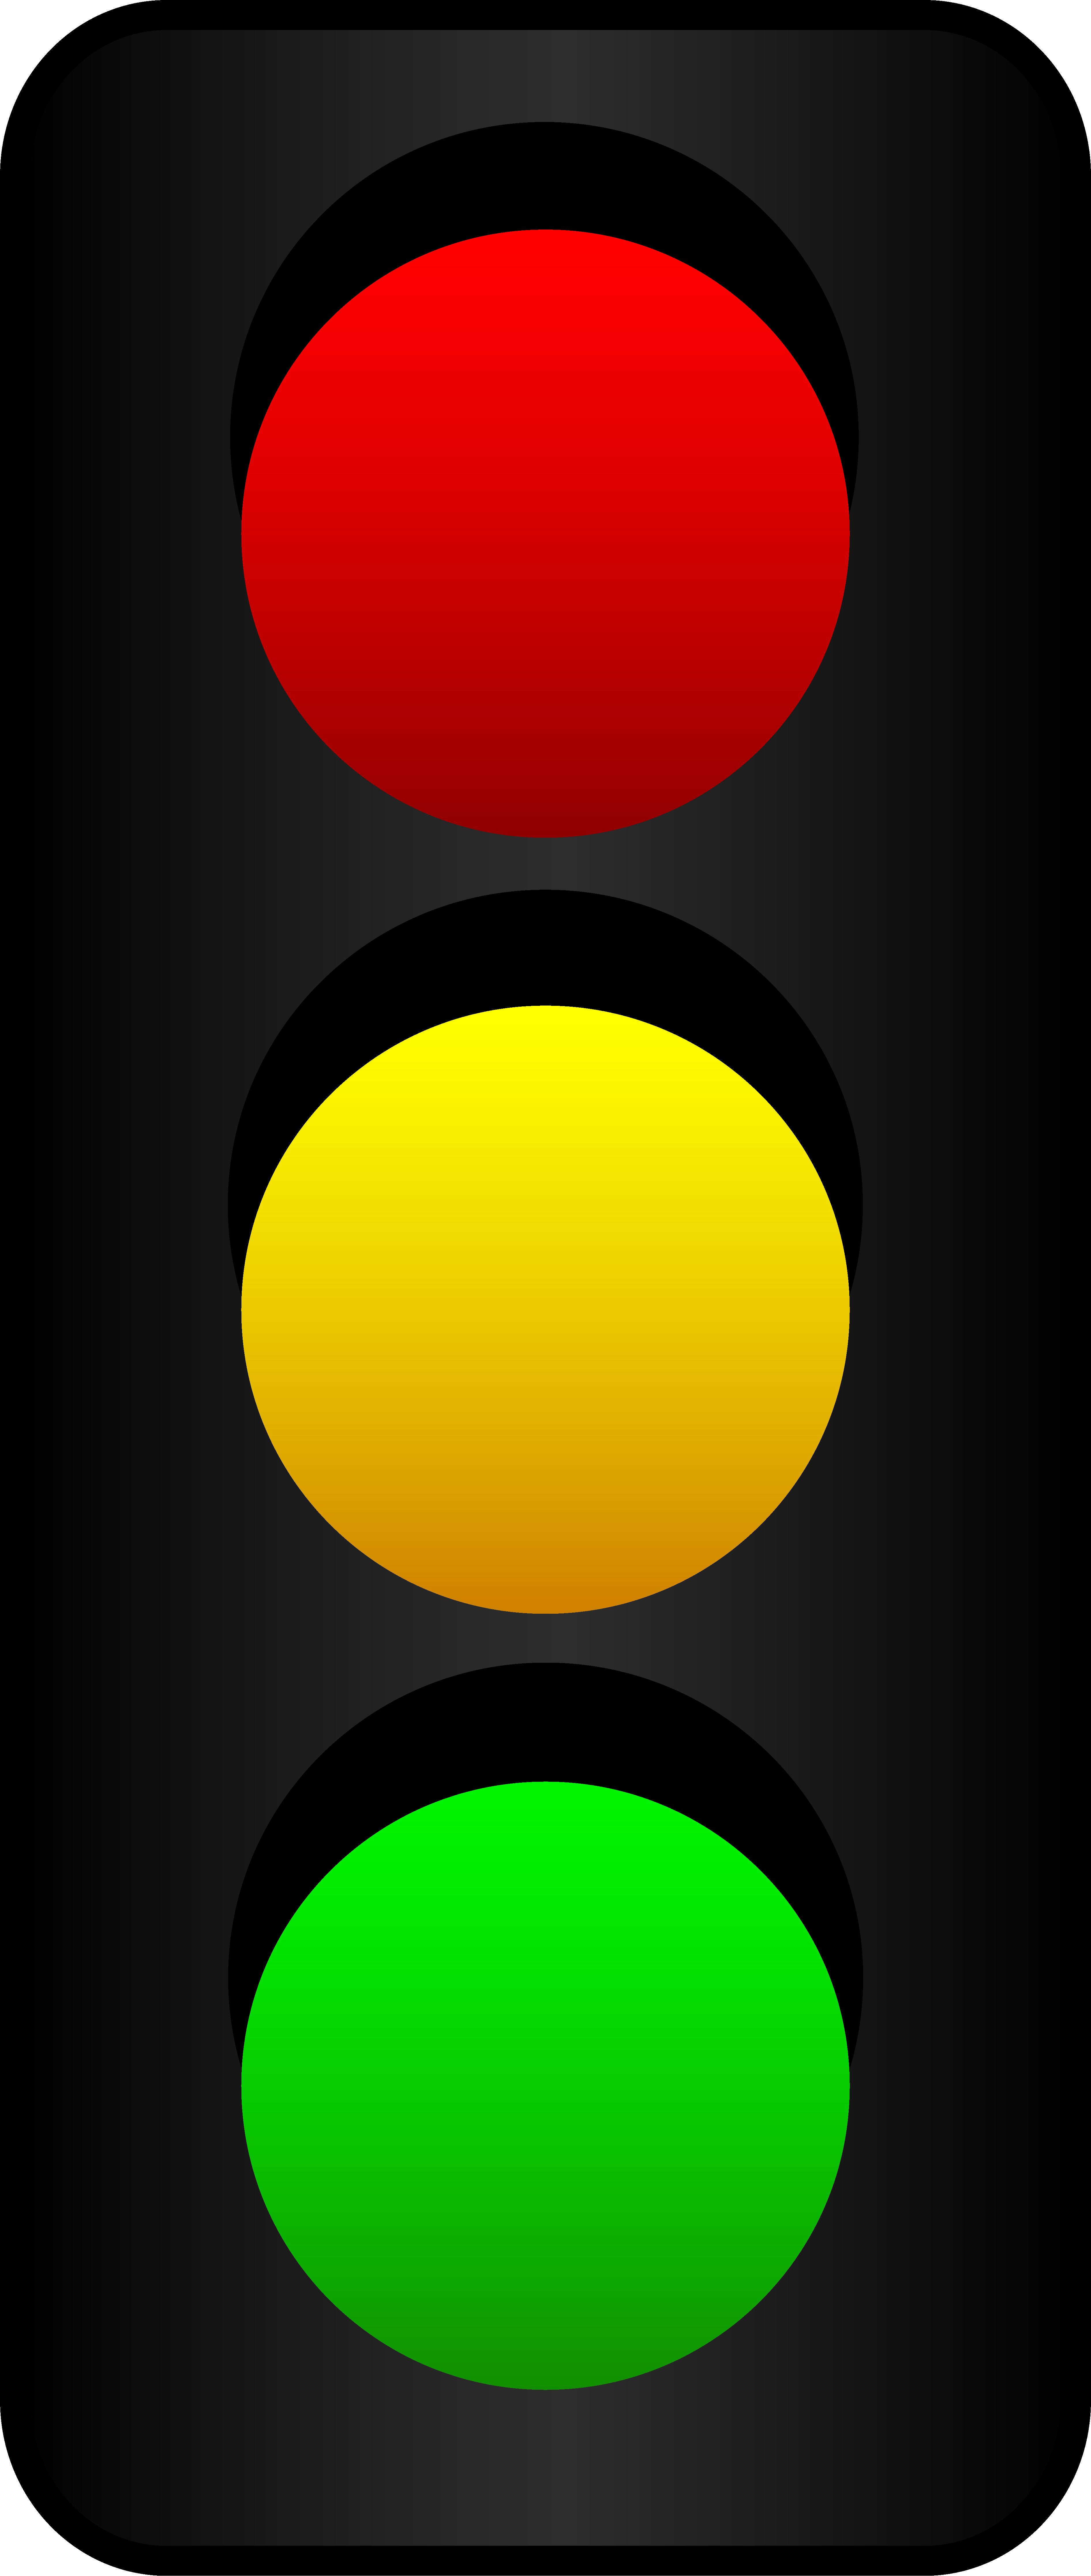 Stoplight clipart tumundografico-Stoplight clipart tumundografico-2